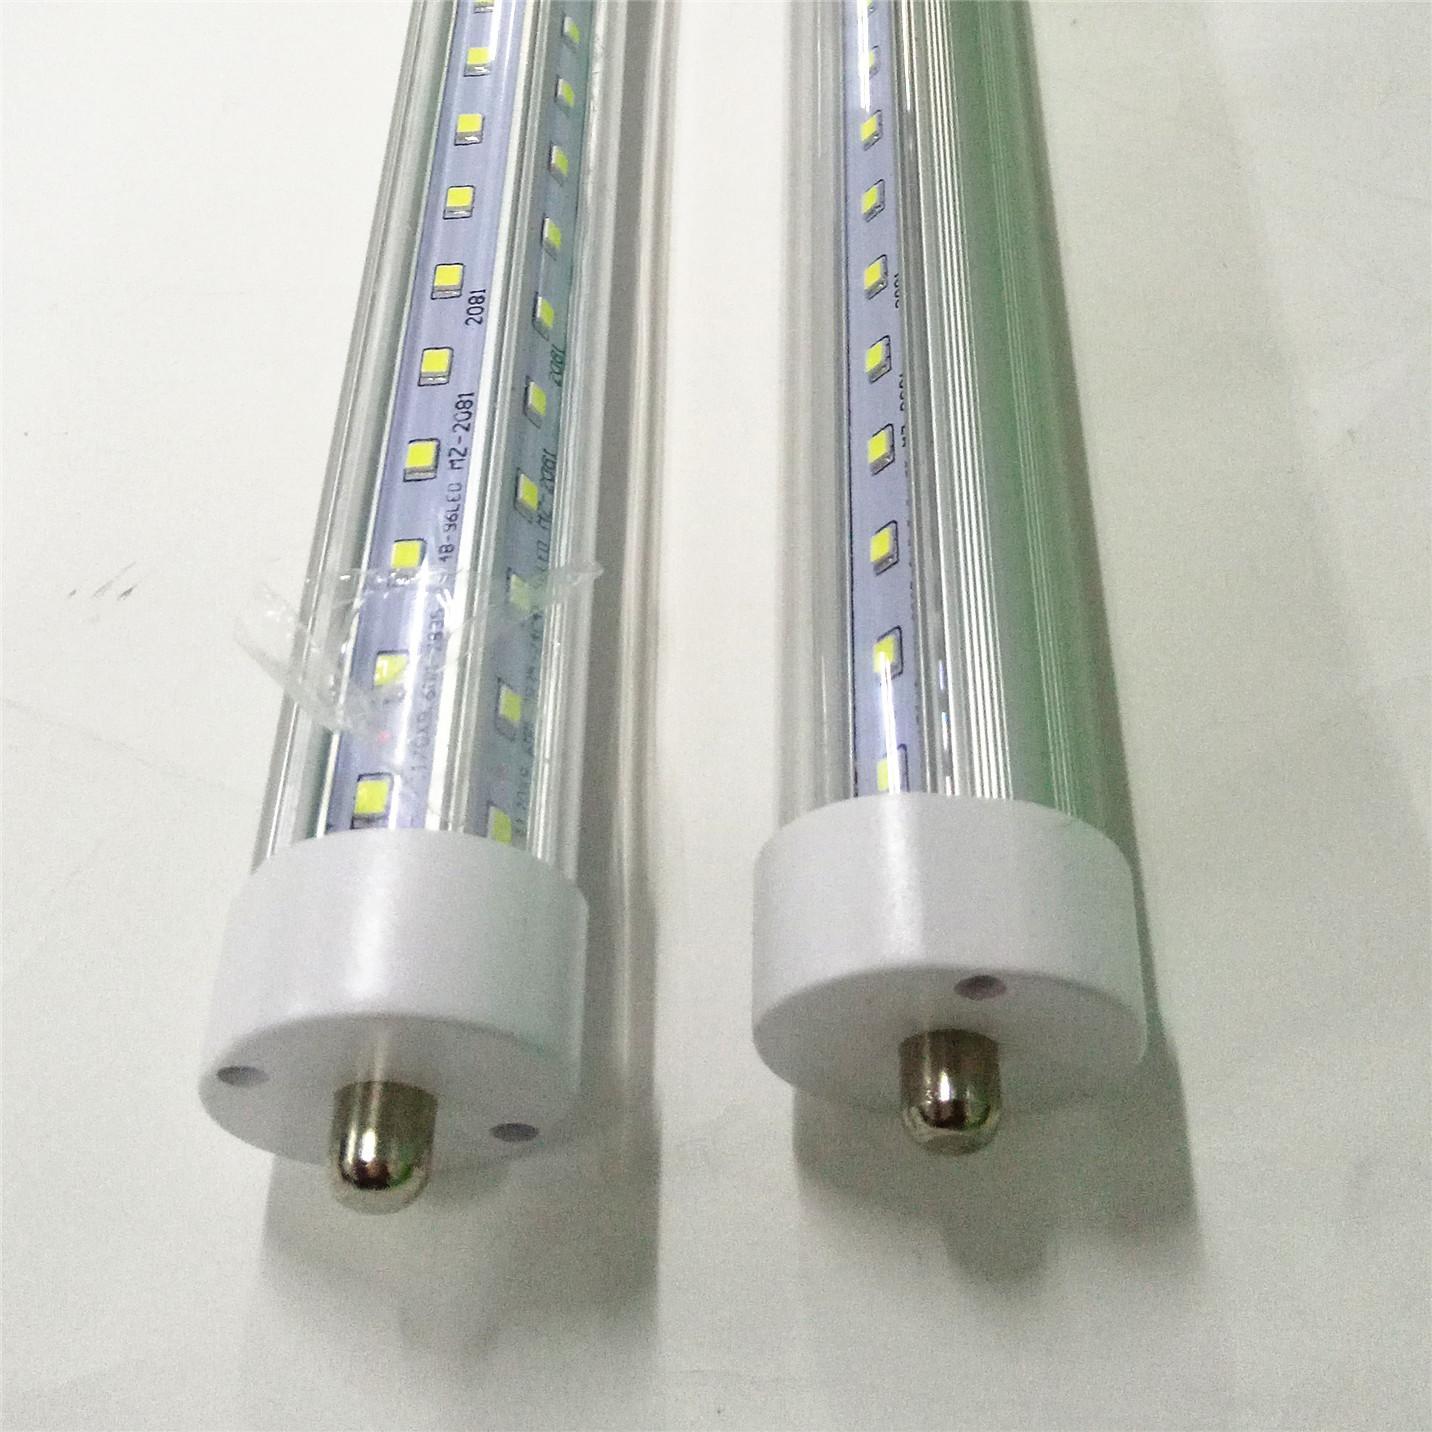 T8 LED أنابيب الأنابيب على شكل حرف V 8FT 7000LM 66W واحد دبوس FA8 R17D AC85-265V 384LEDS 2835SMD المصابيح الفلورية 2400mm مباشرة من الصين مصنع